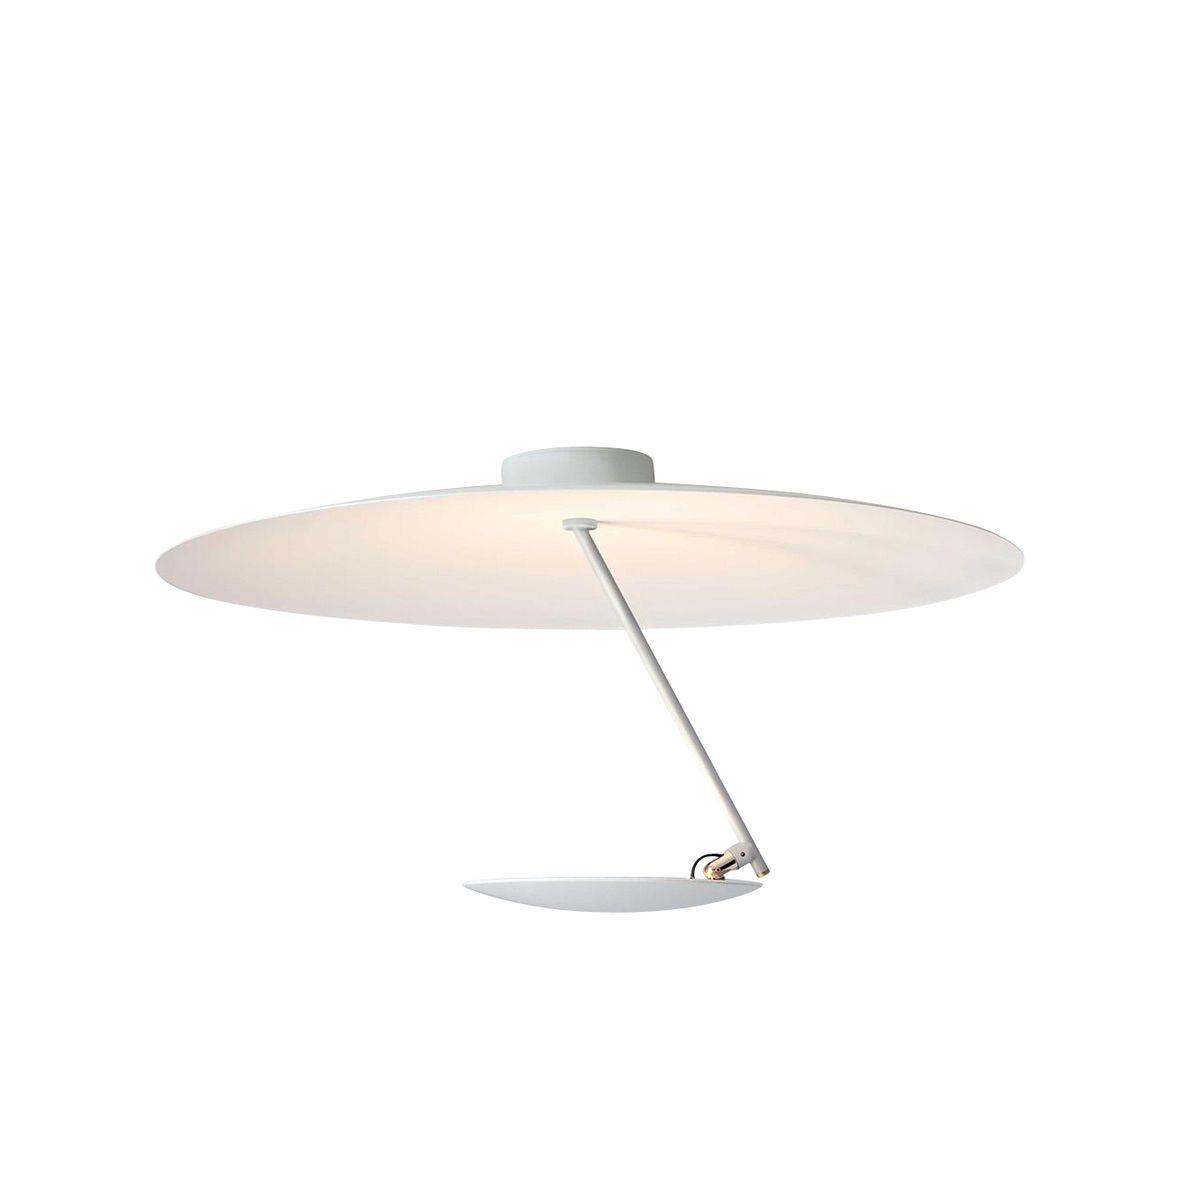 lederam c150 led plafondlamp catellani smith. Black Bedroom Furniture Sets. Home Design Ideas